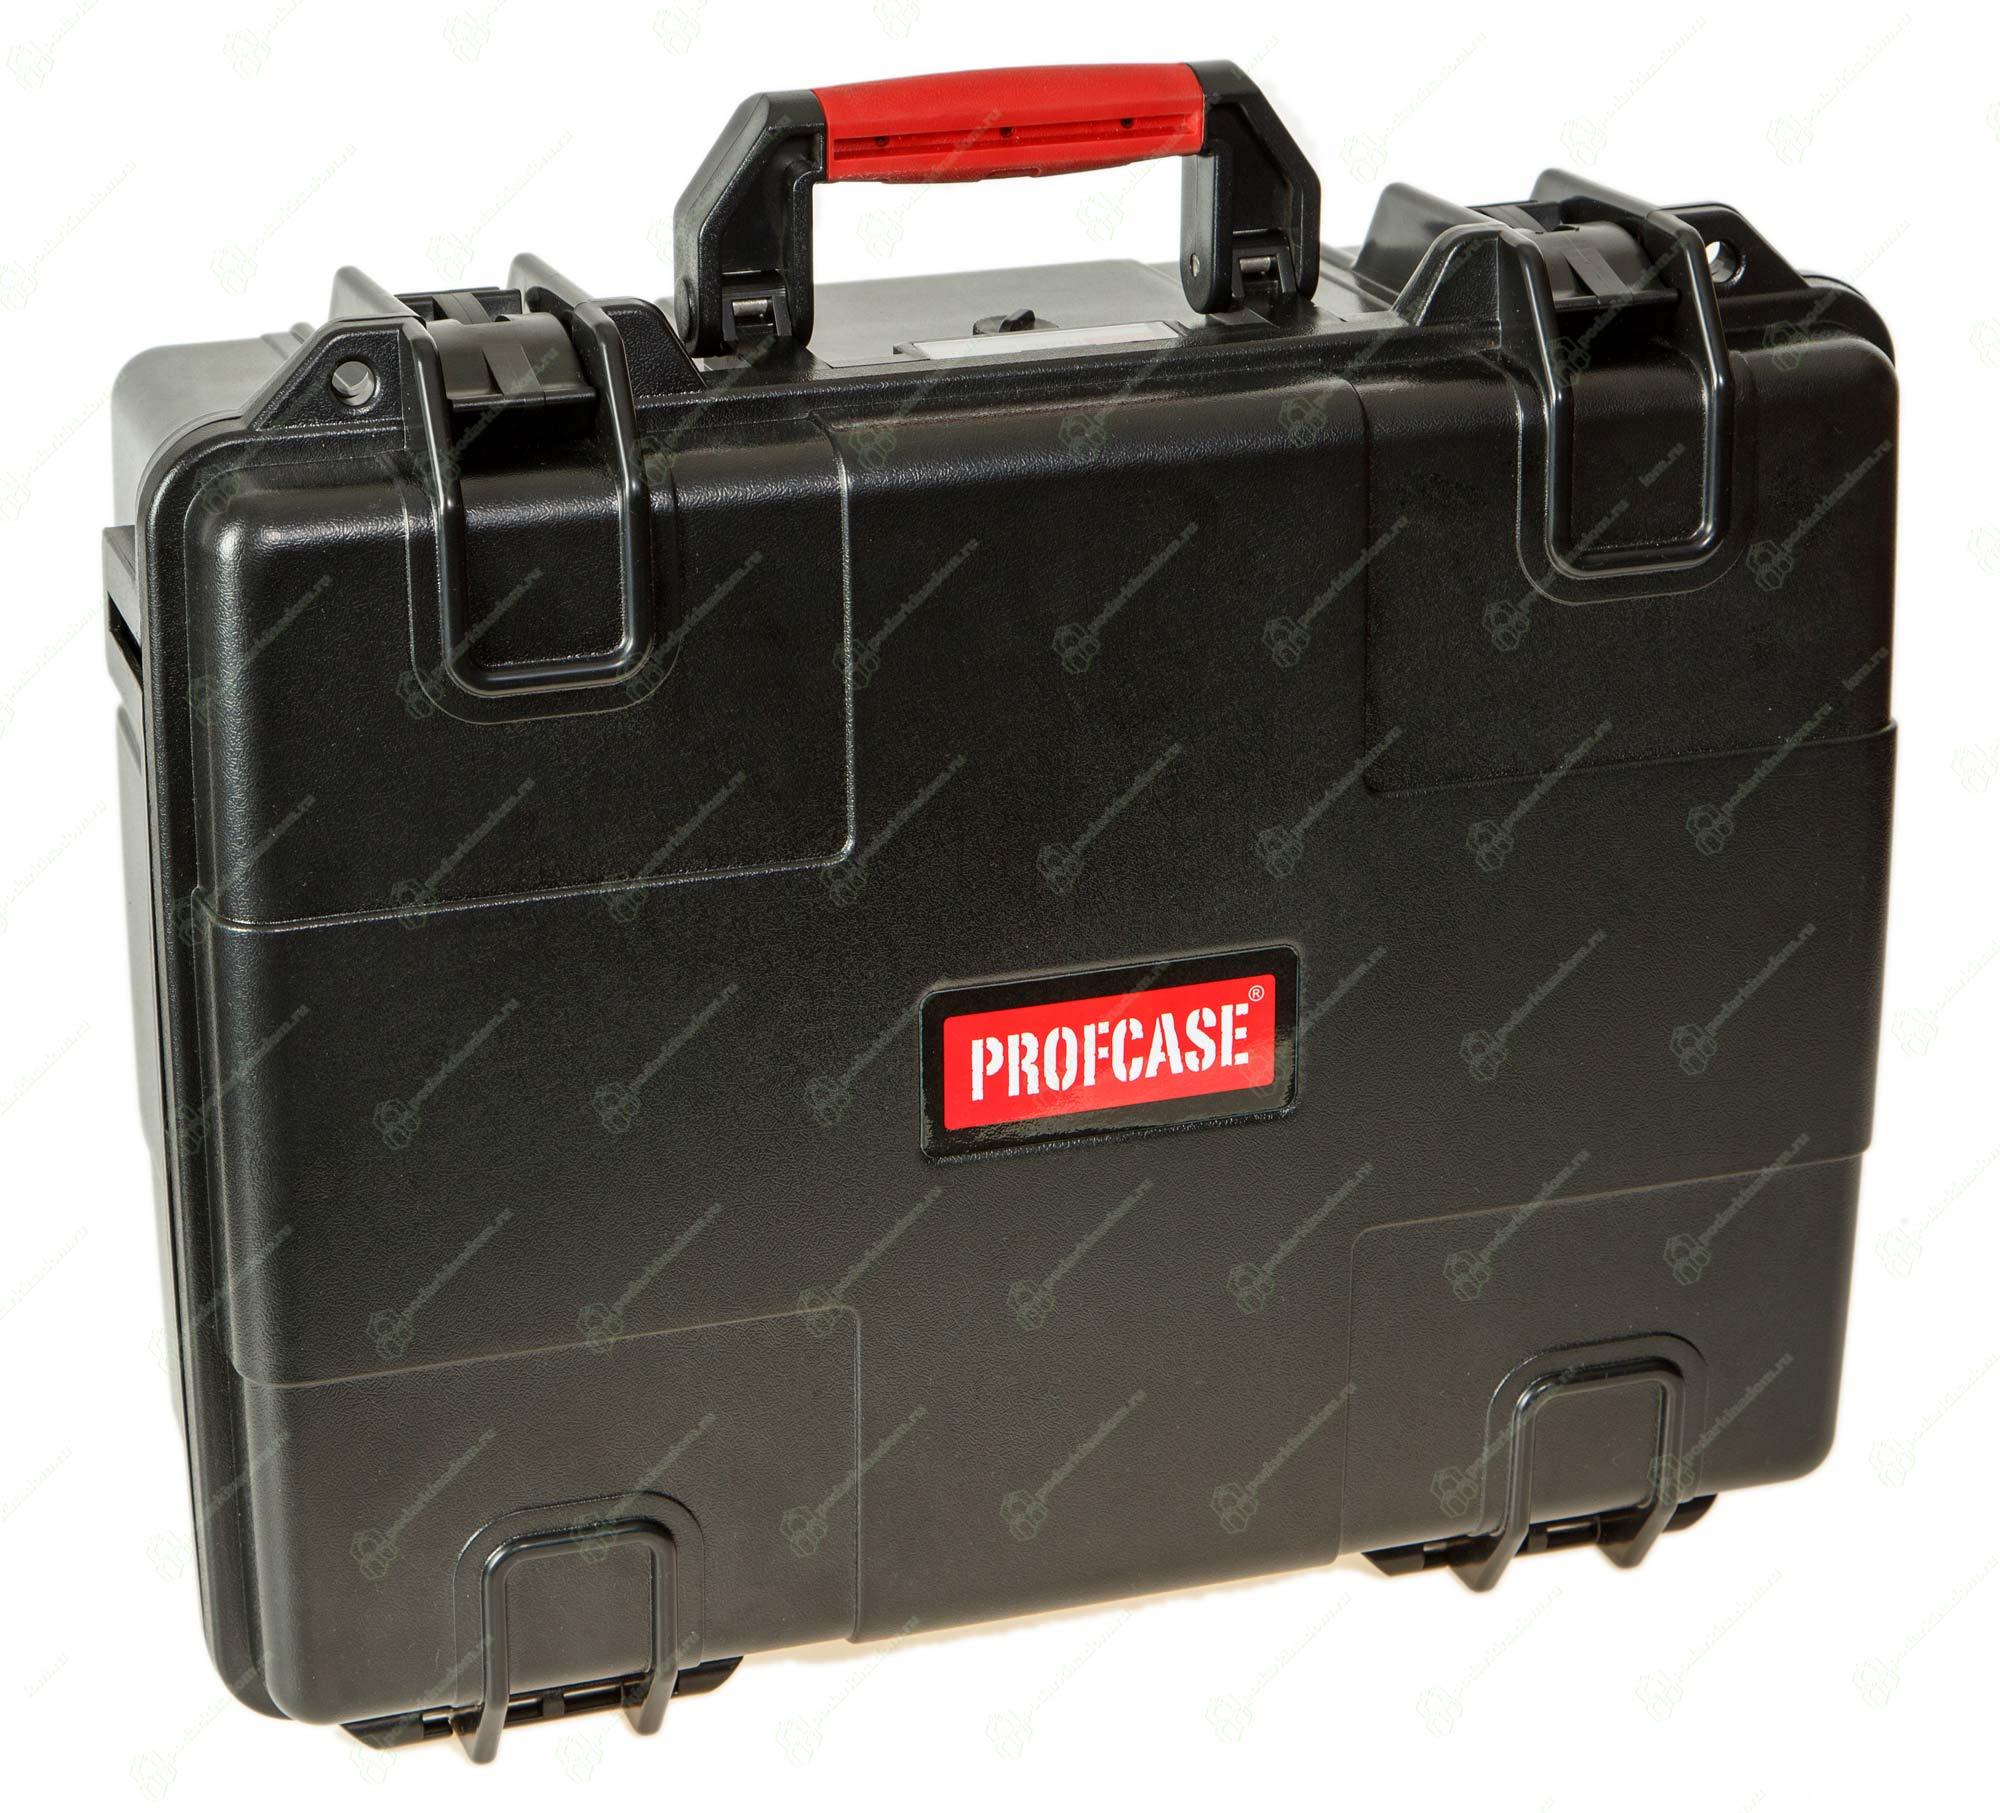 Profcase PRC 43.32-4/13